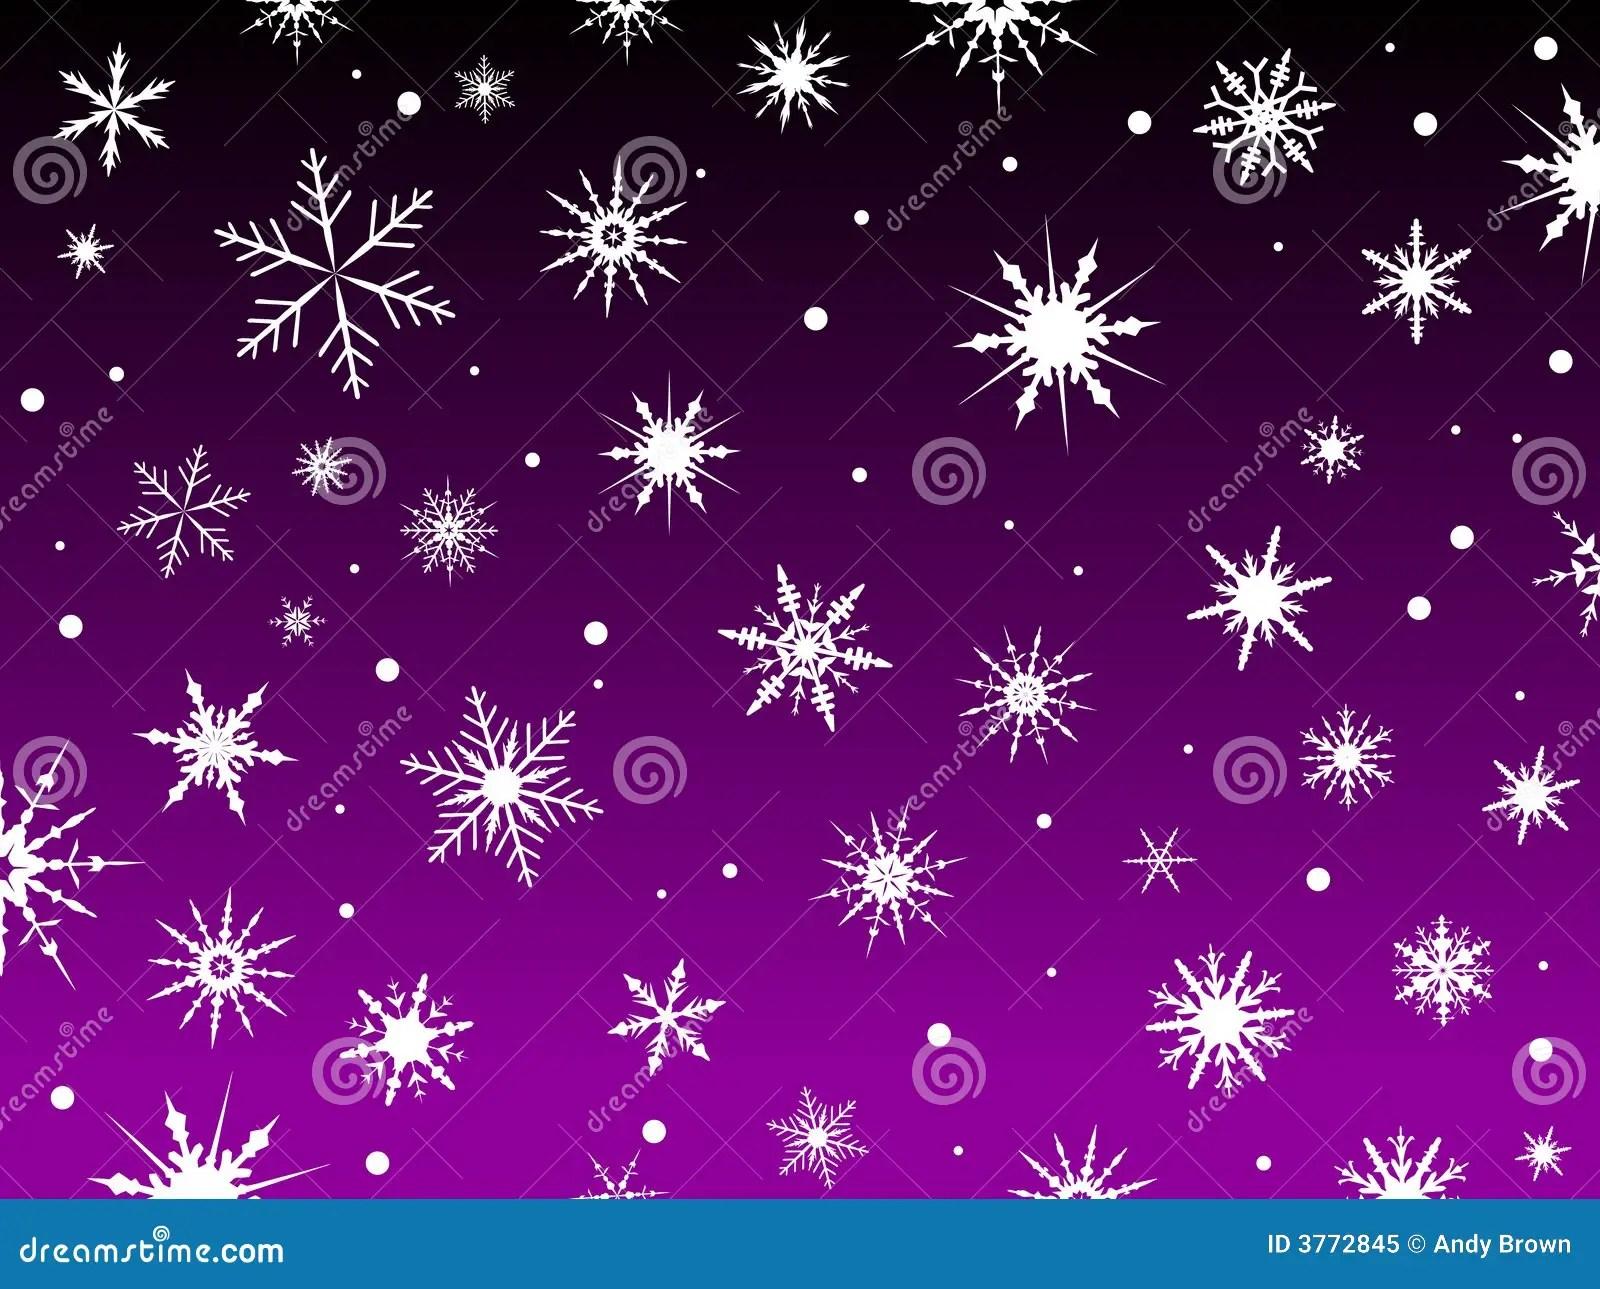 Free Desktop Wallpaper Falling Snow Snow Border Purple Stock Vector Illustration Of Snow